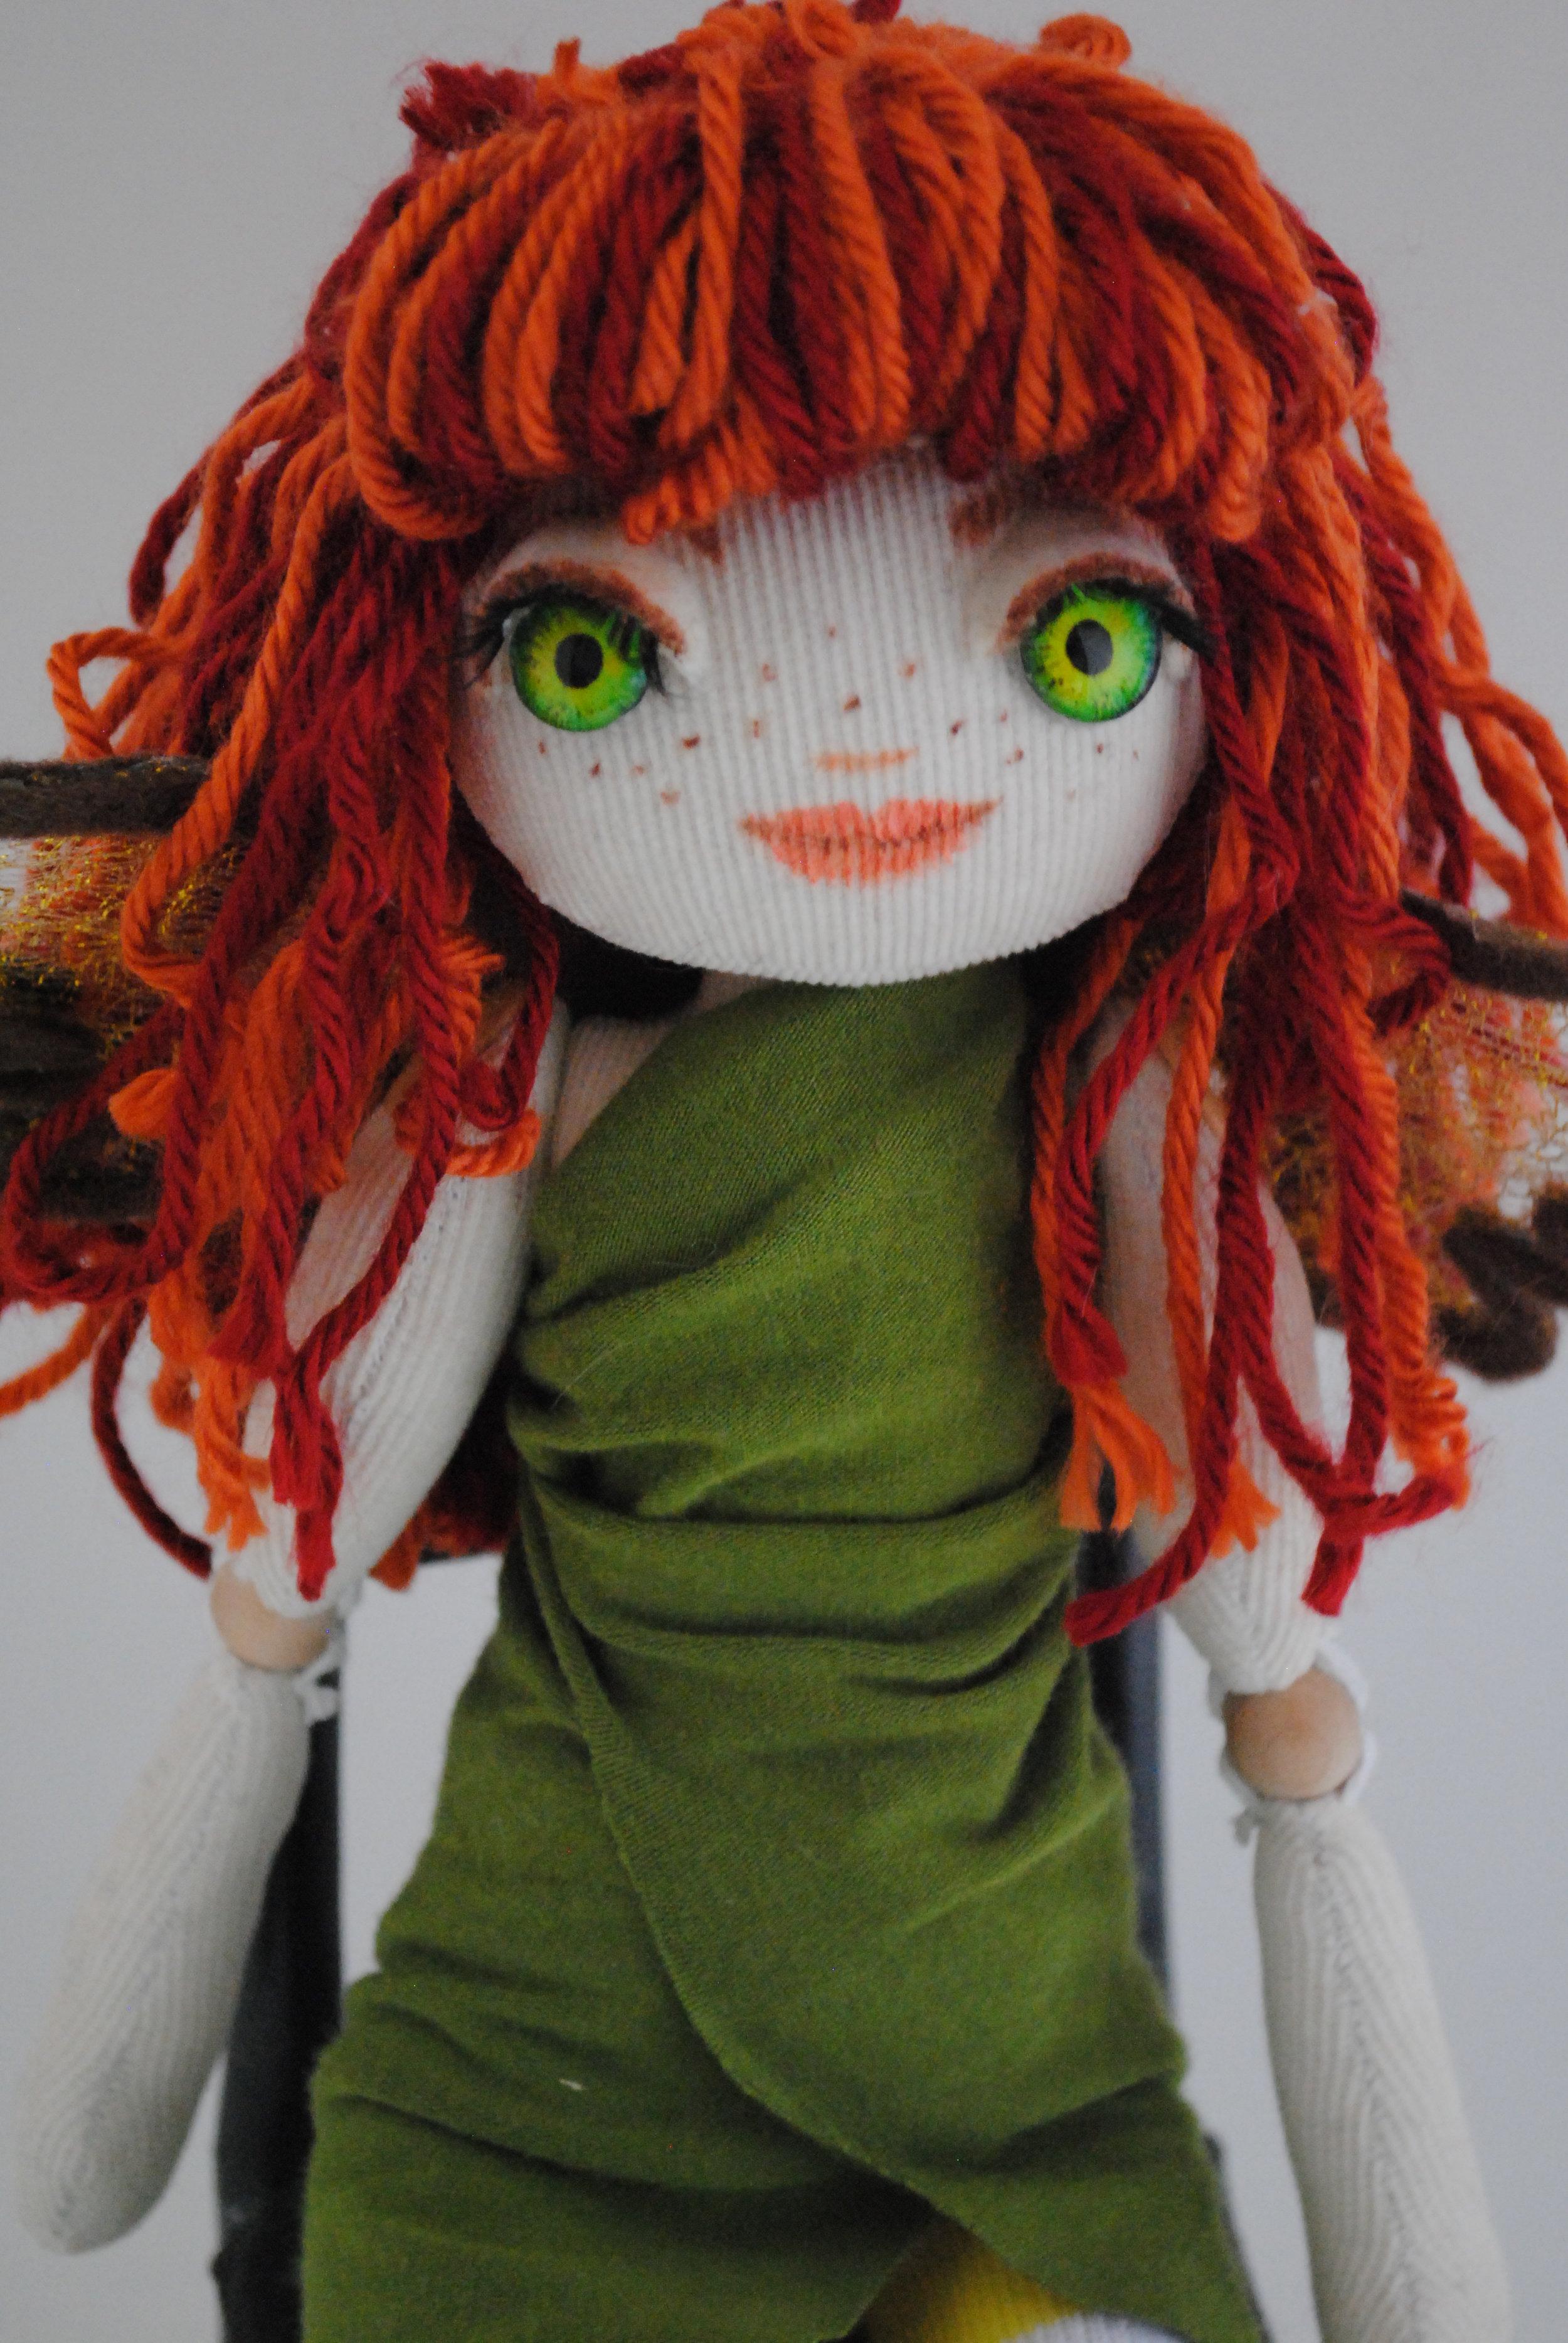 dolls 12 2016 046.JPG